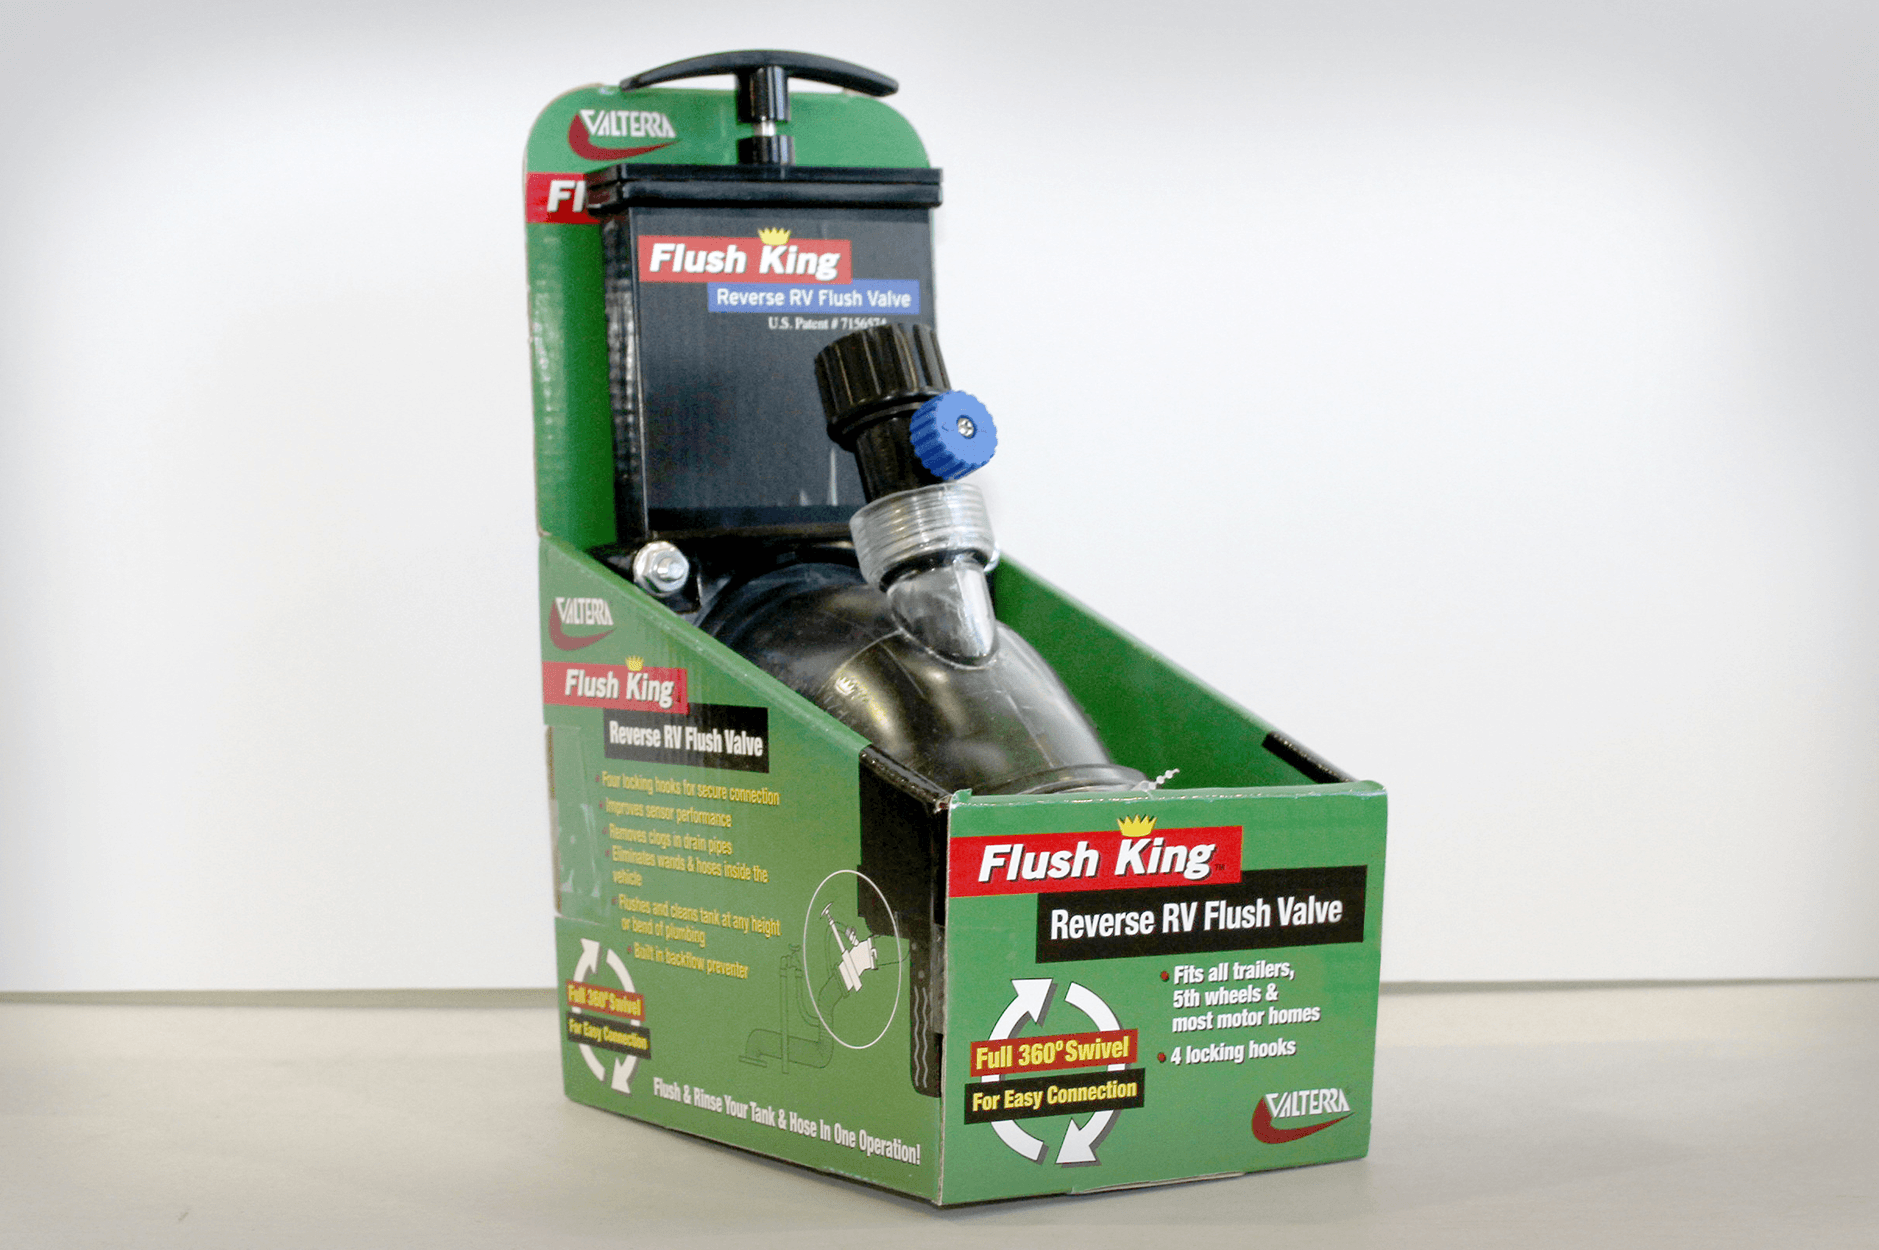 Flush King Reverse RV Flush Valve